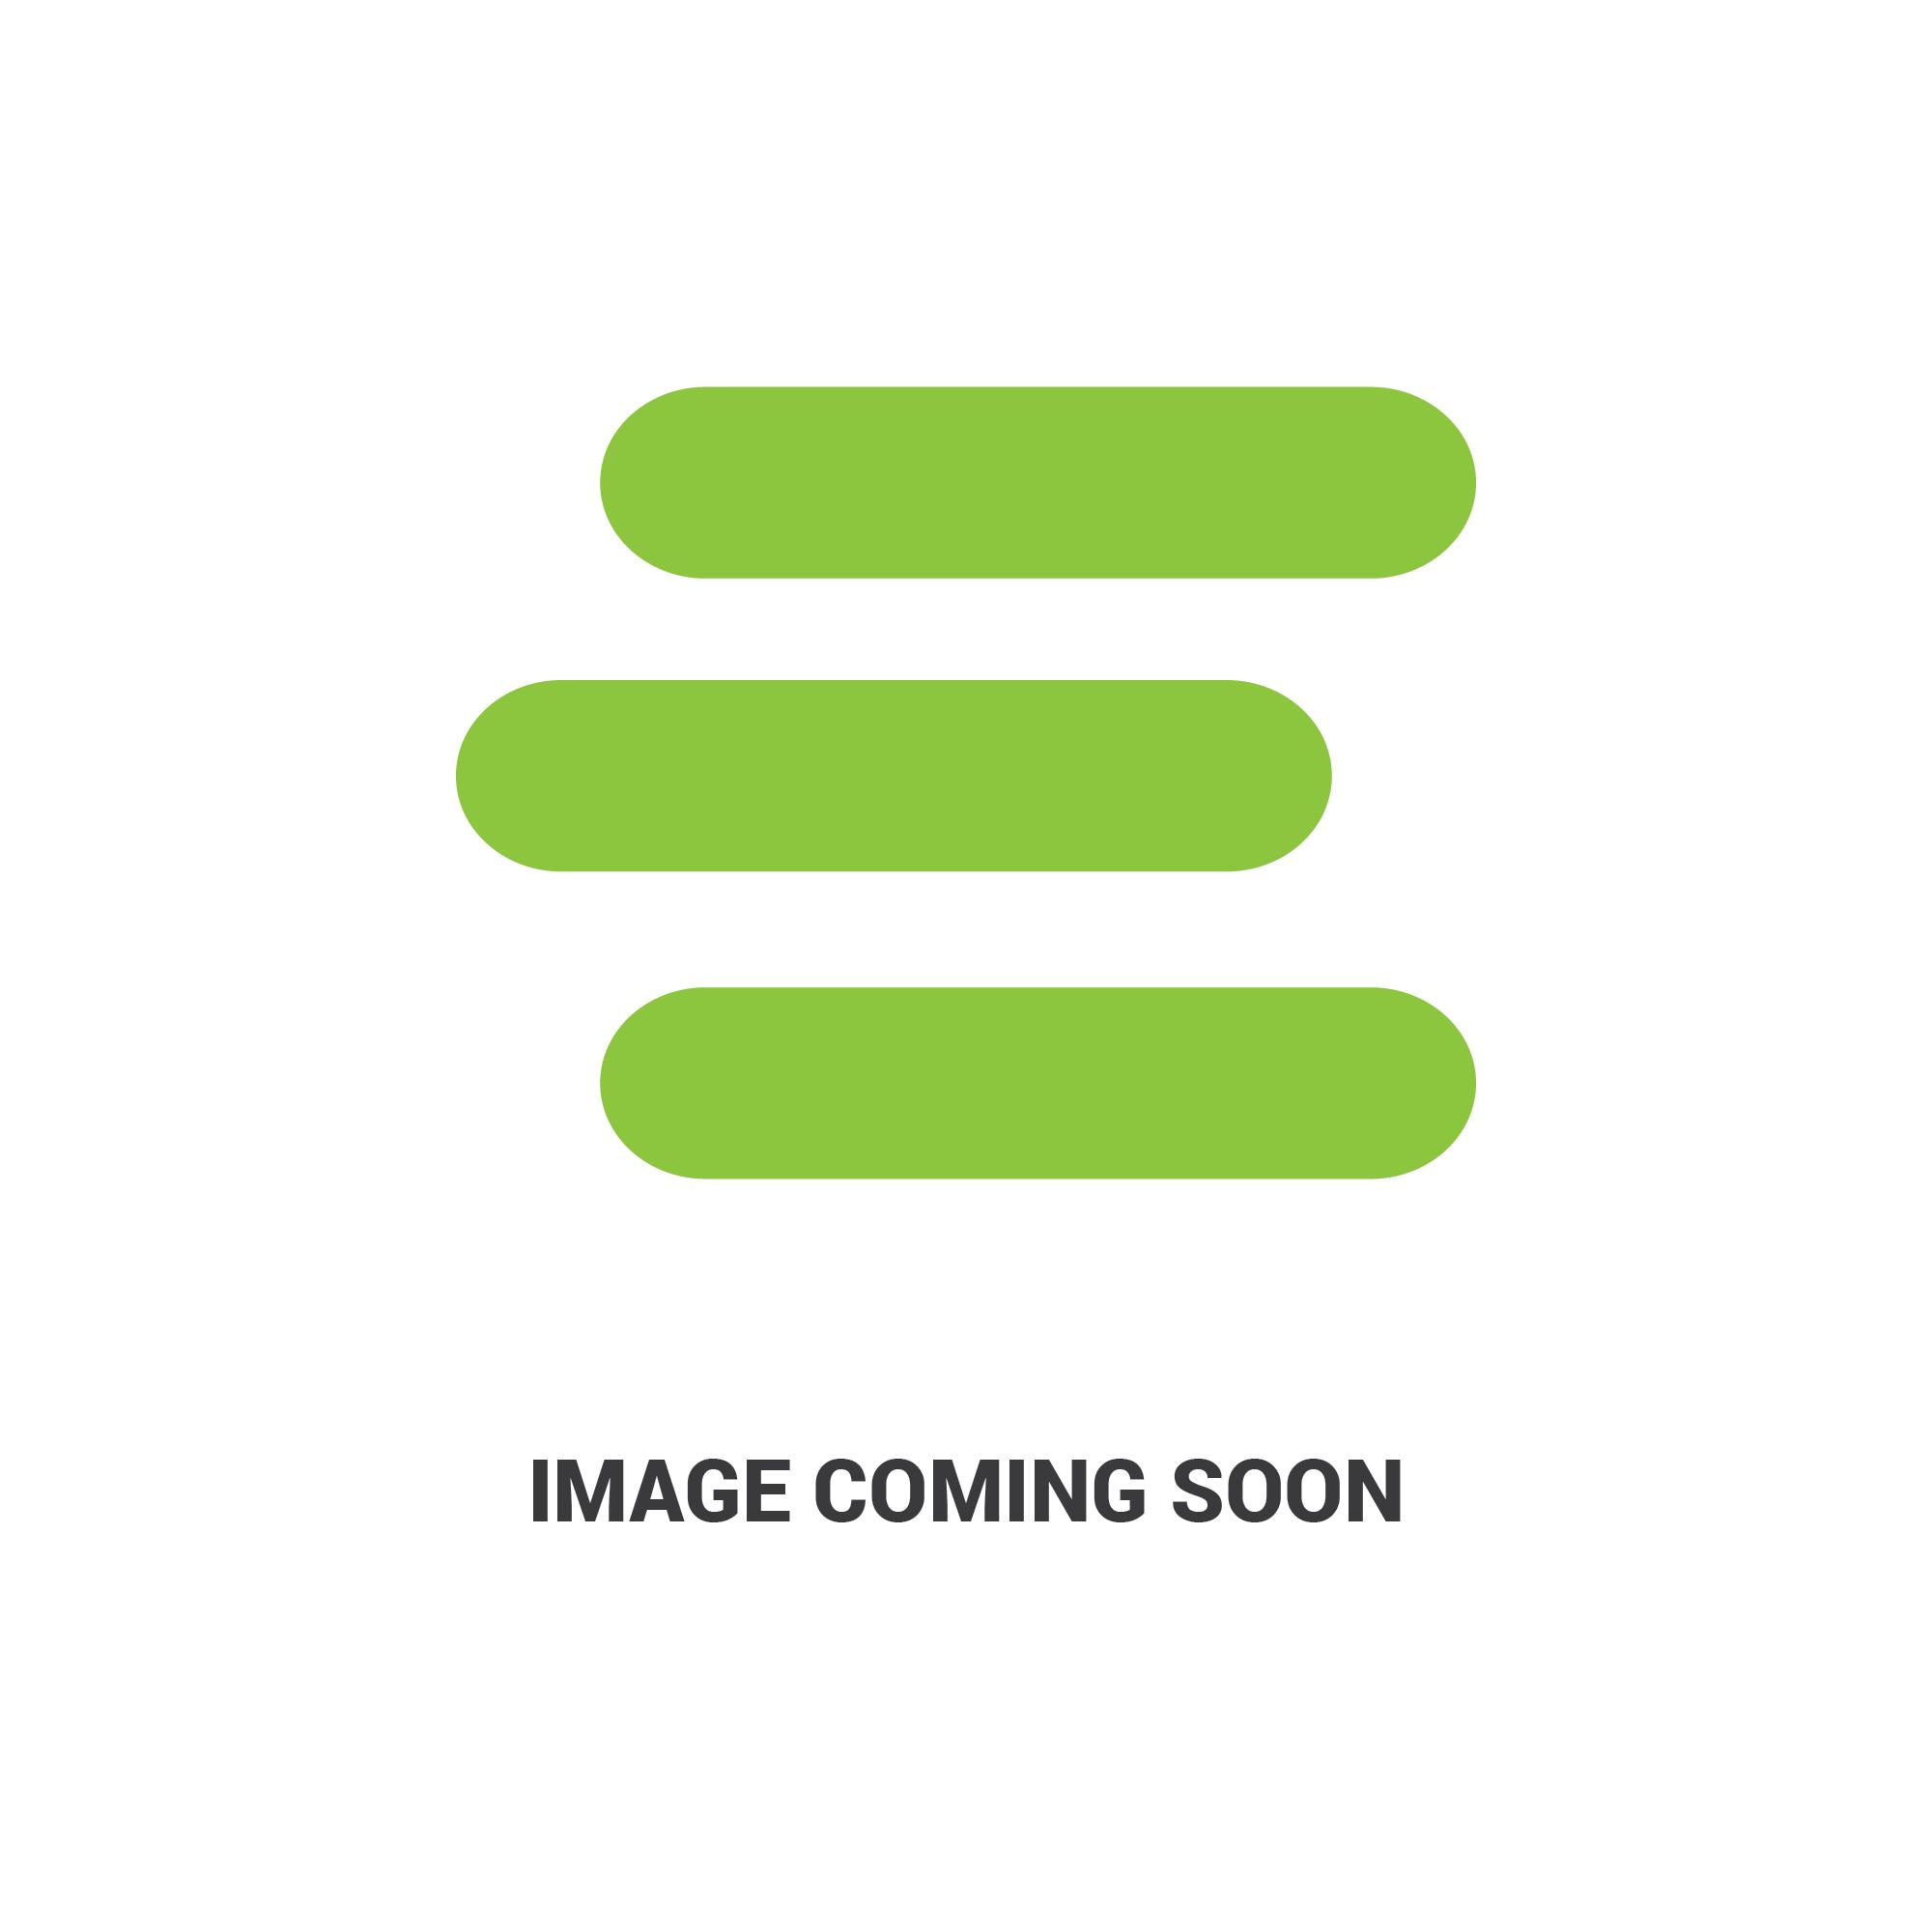 E-TL500Fedit 1.2.jpg